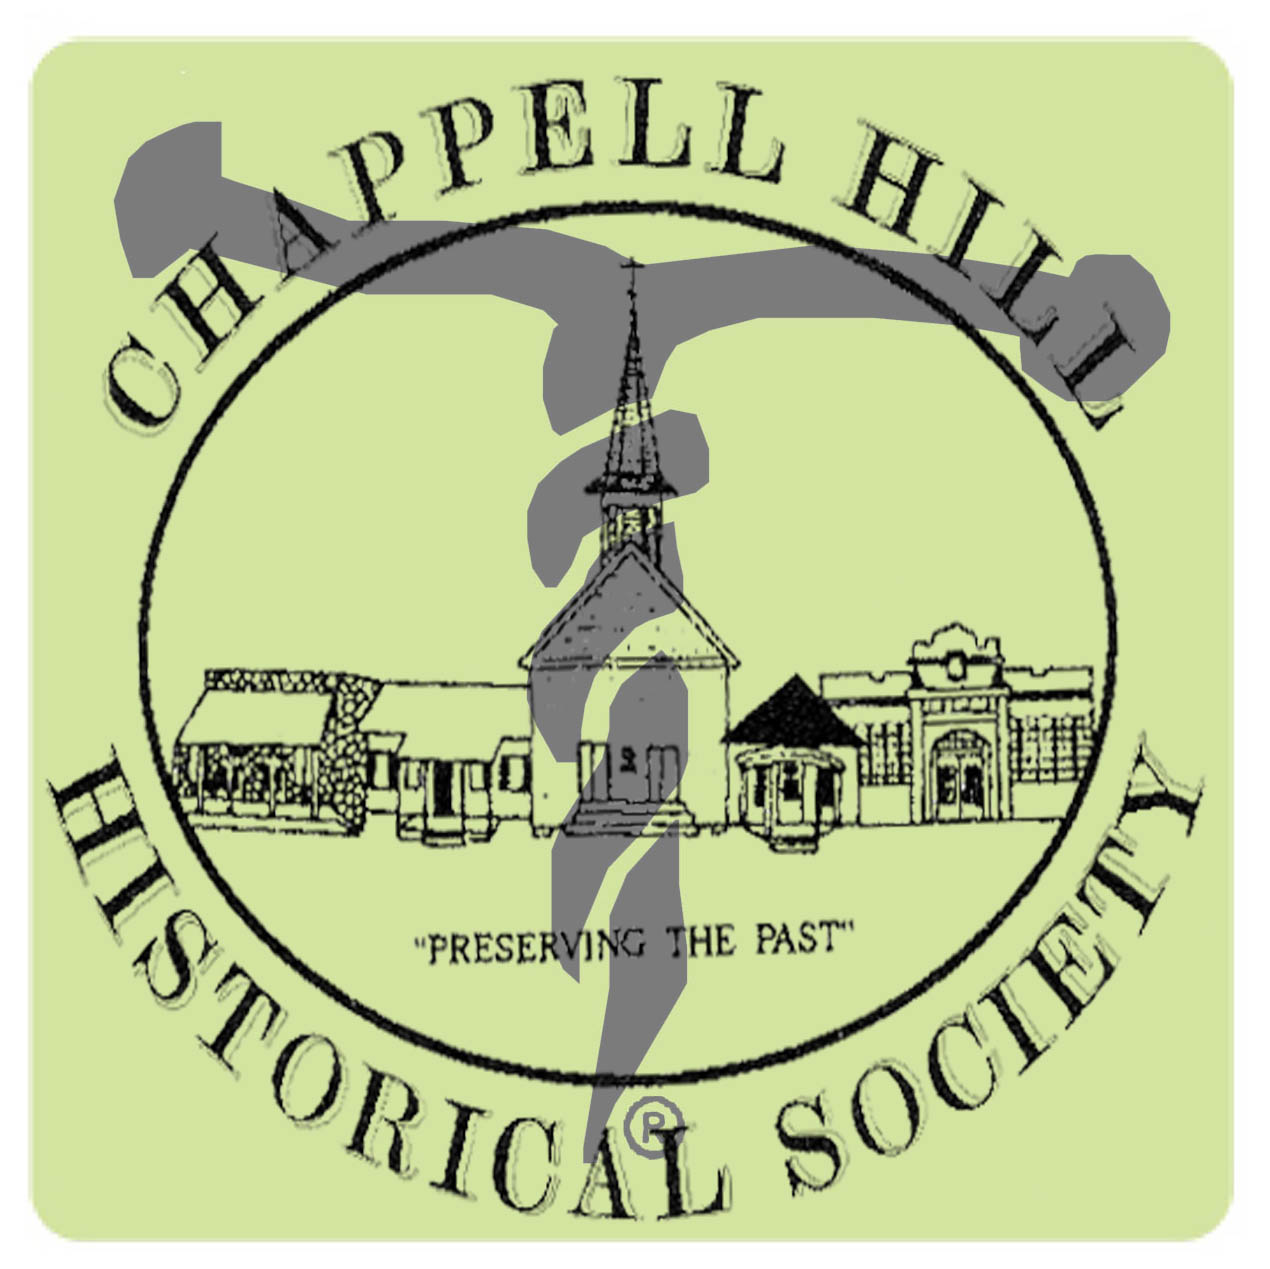 AOTN Chappell Hill BB Fest.jpg